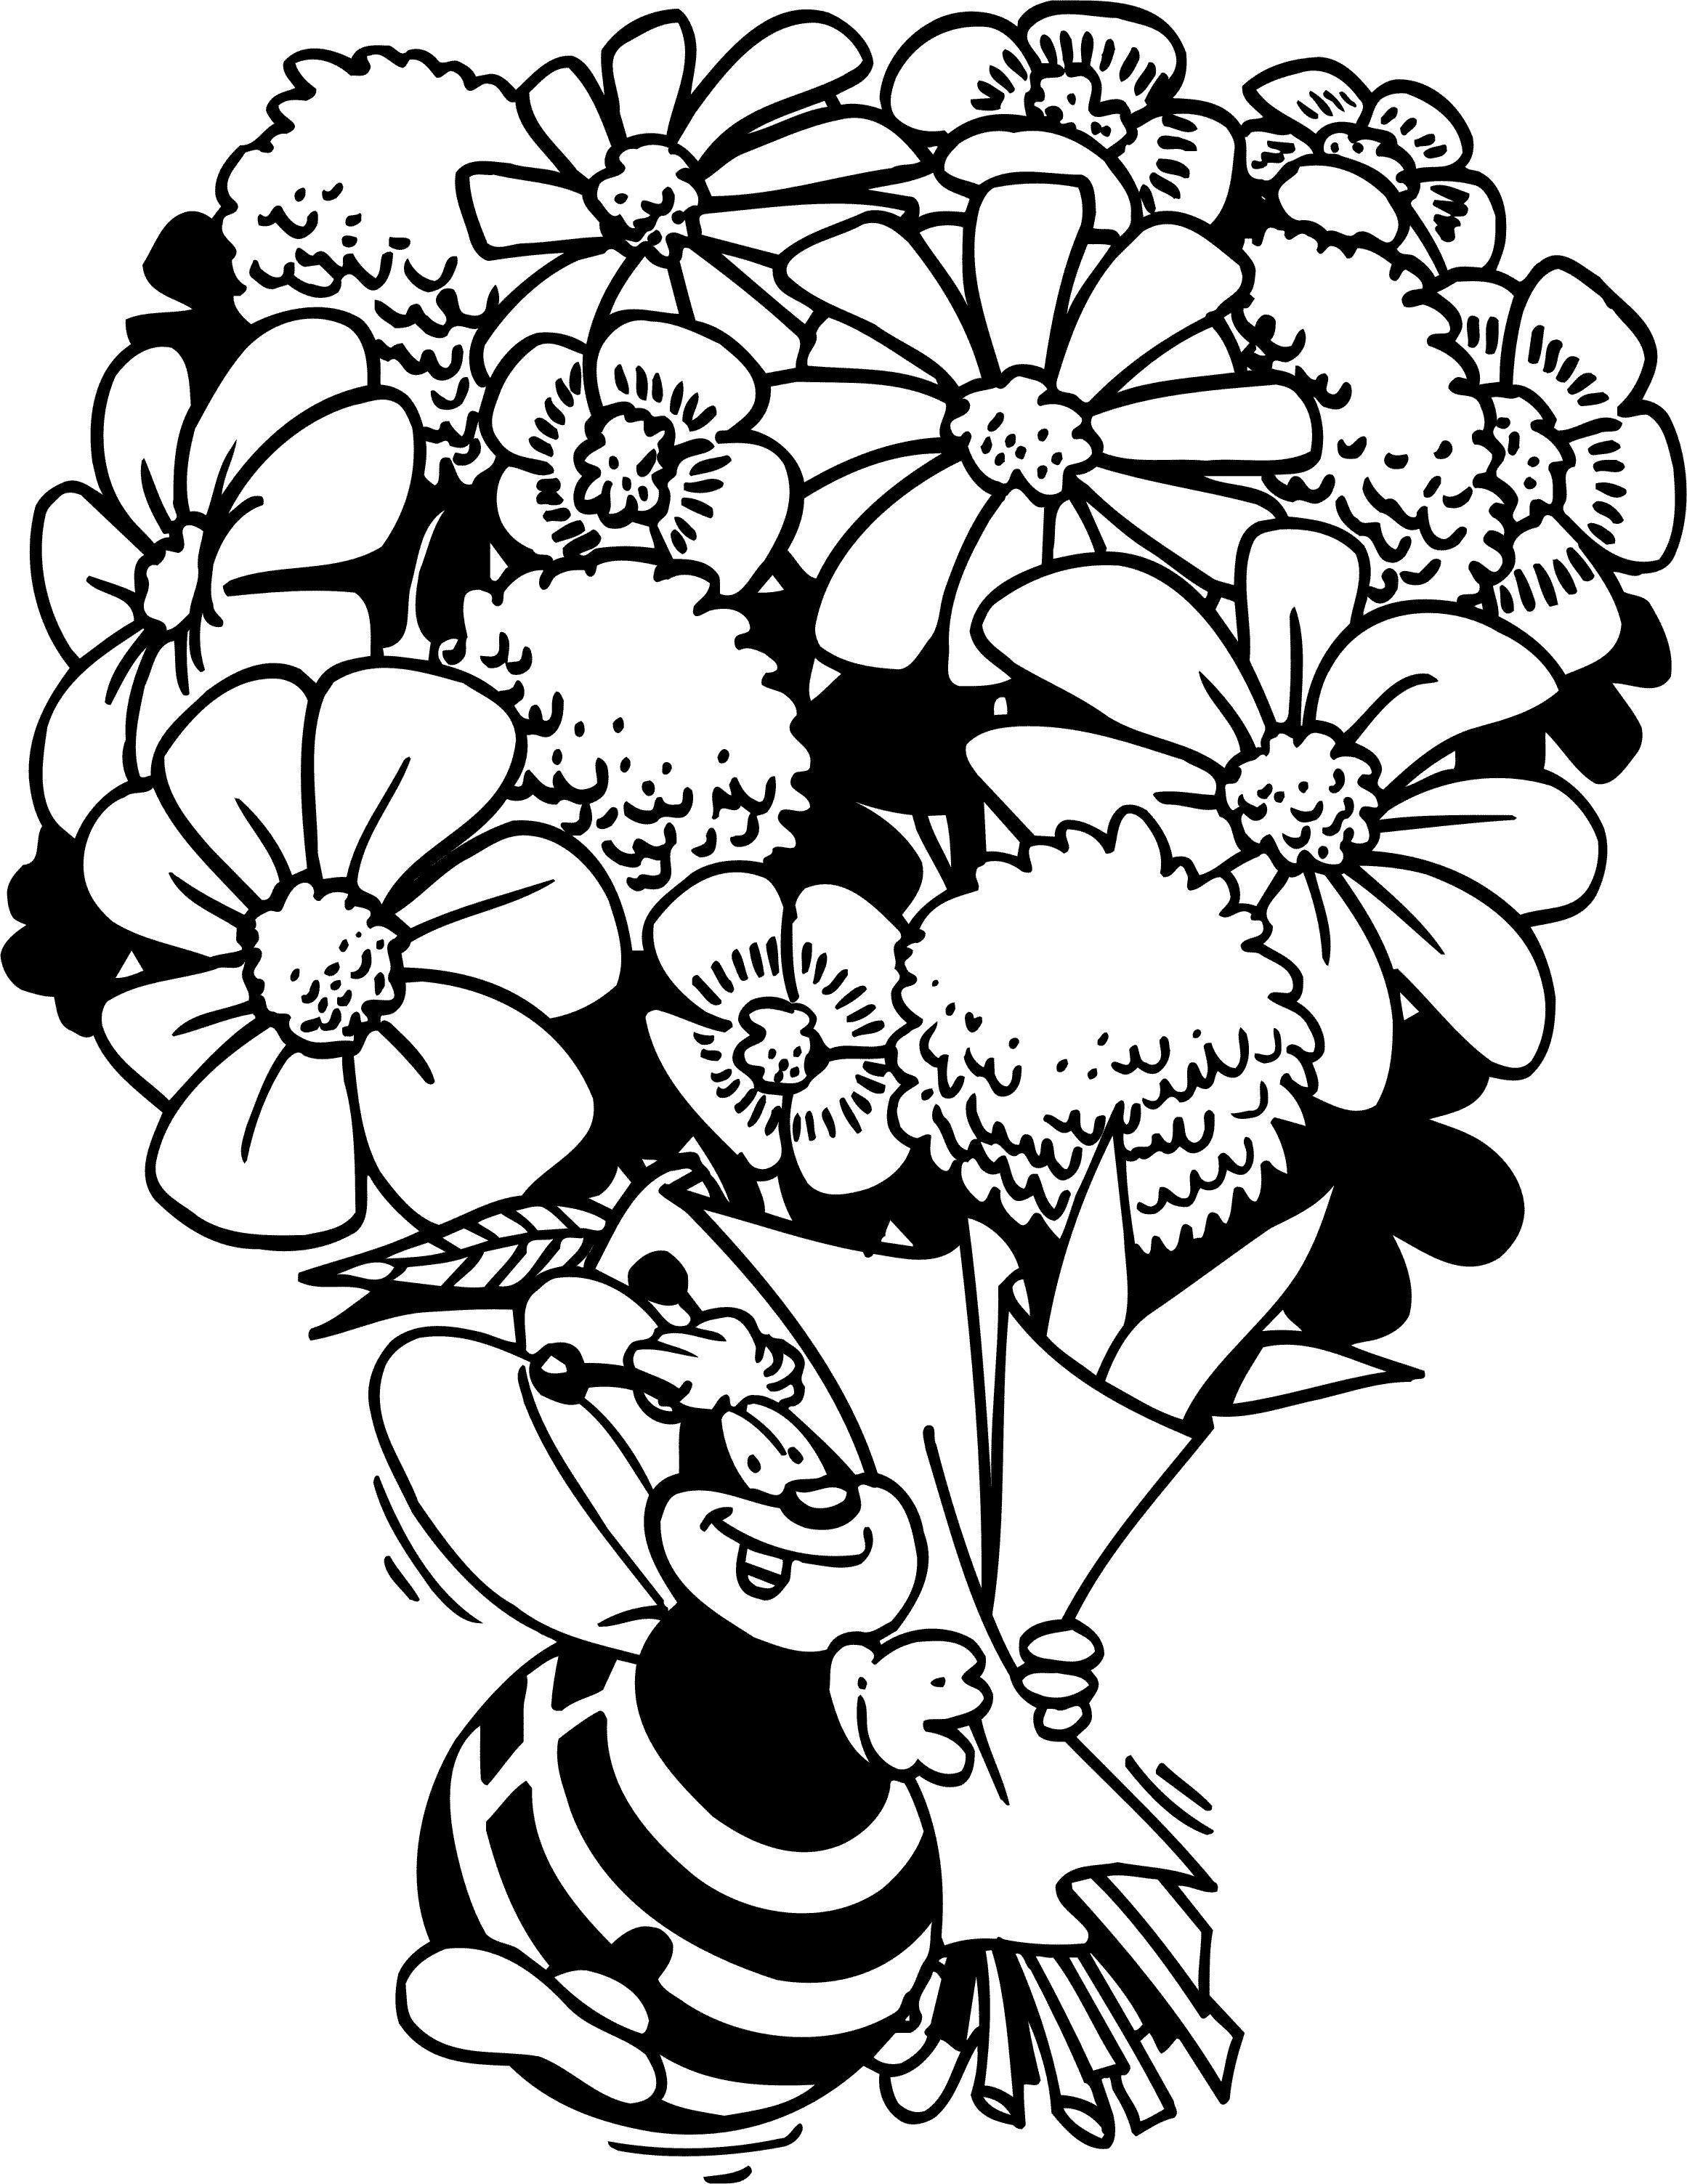 Картинки с букетами цветов для раскраски